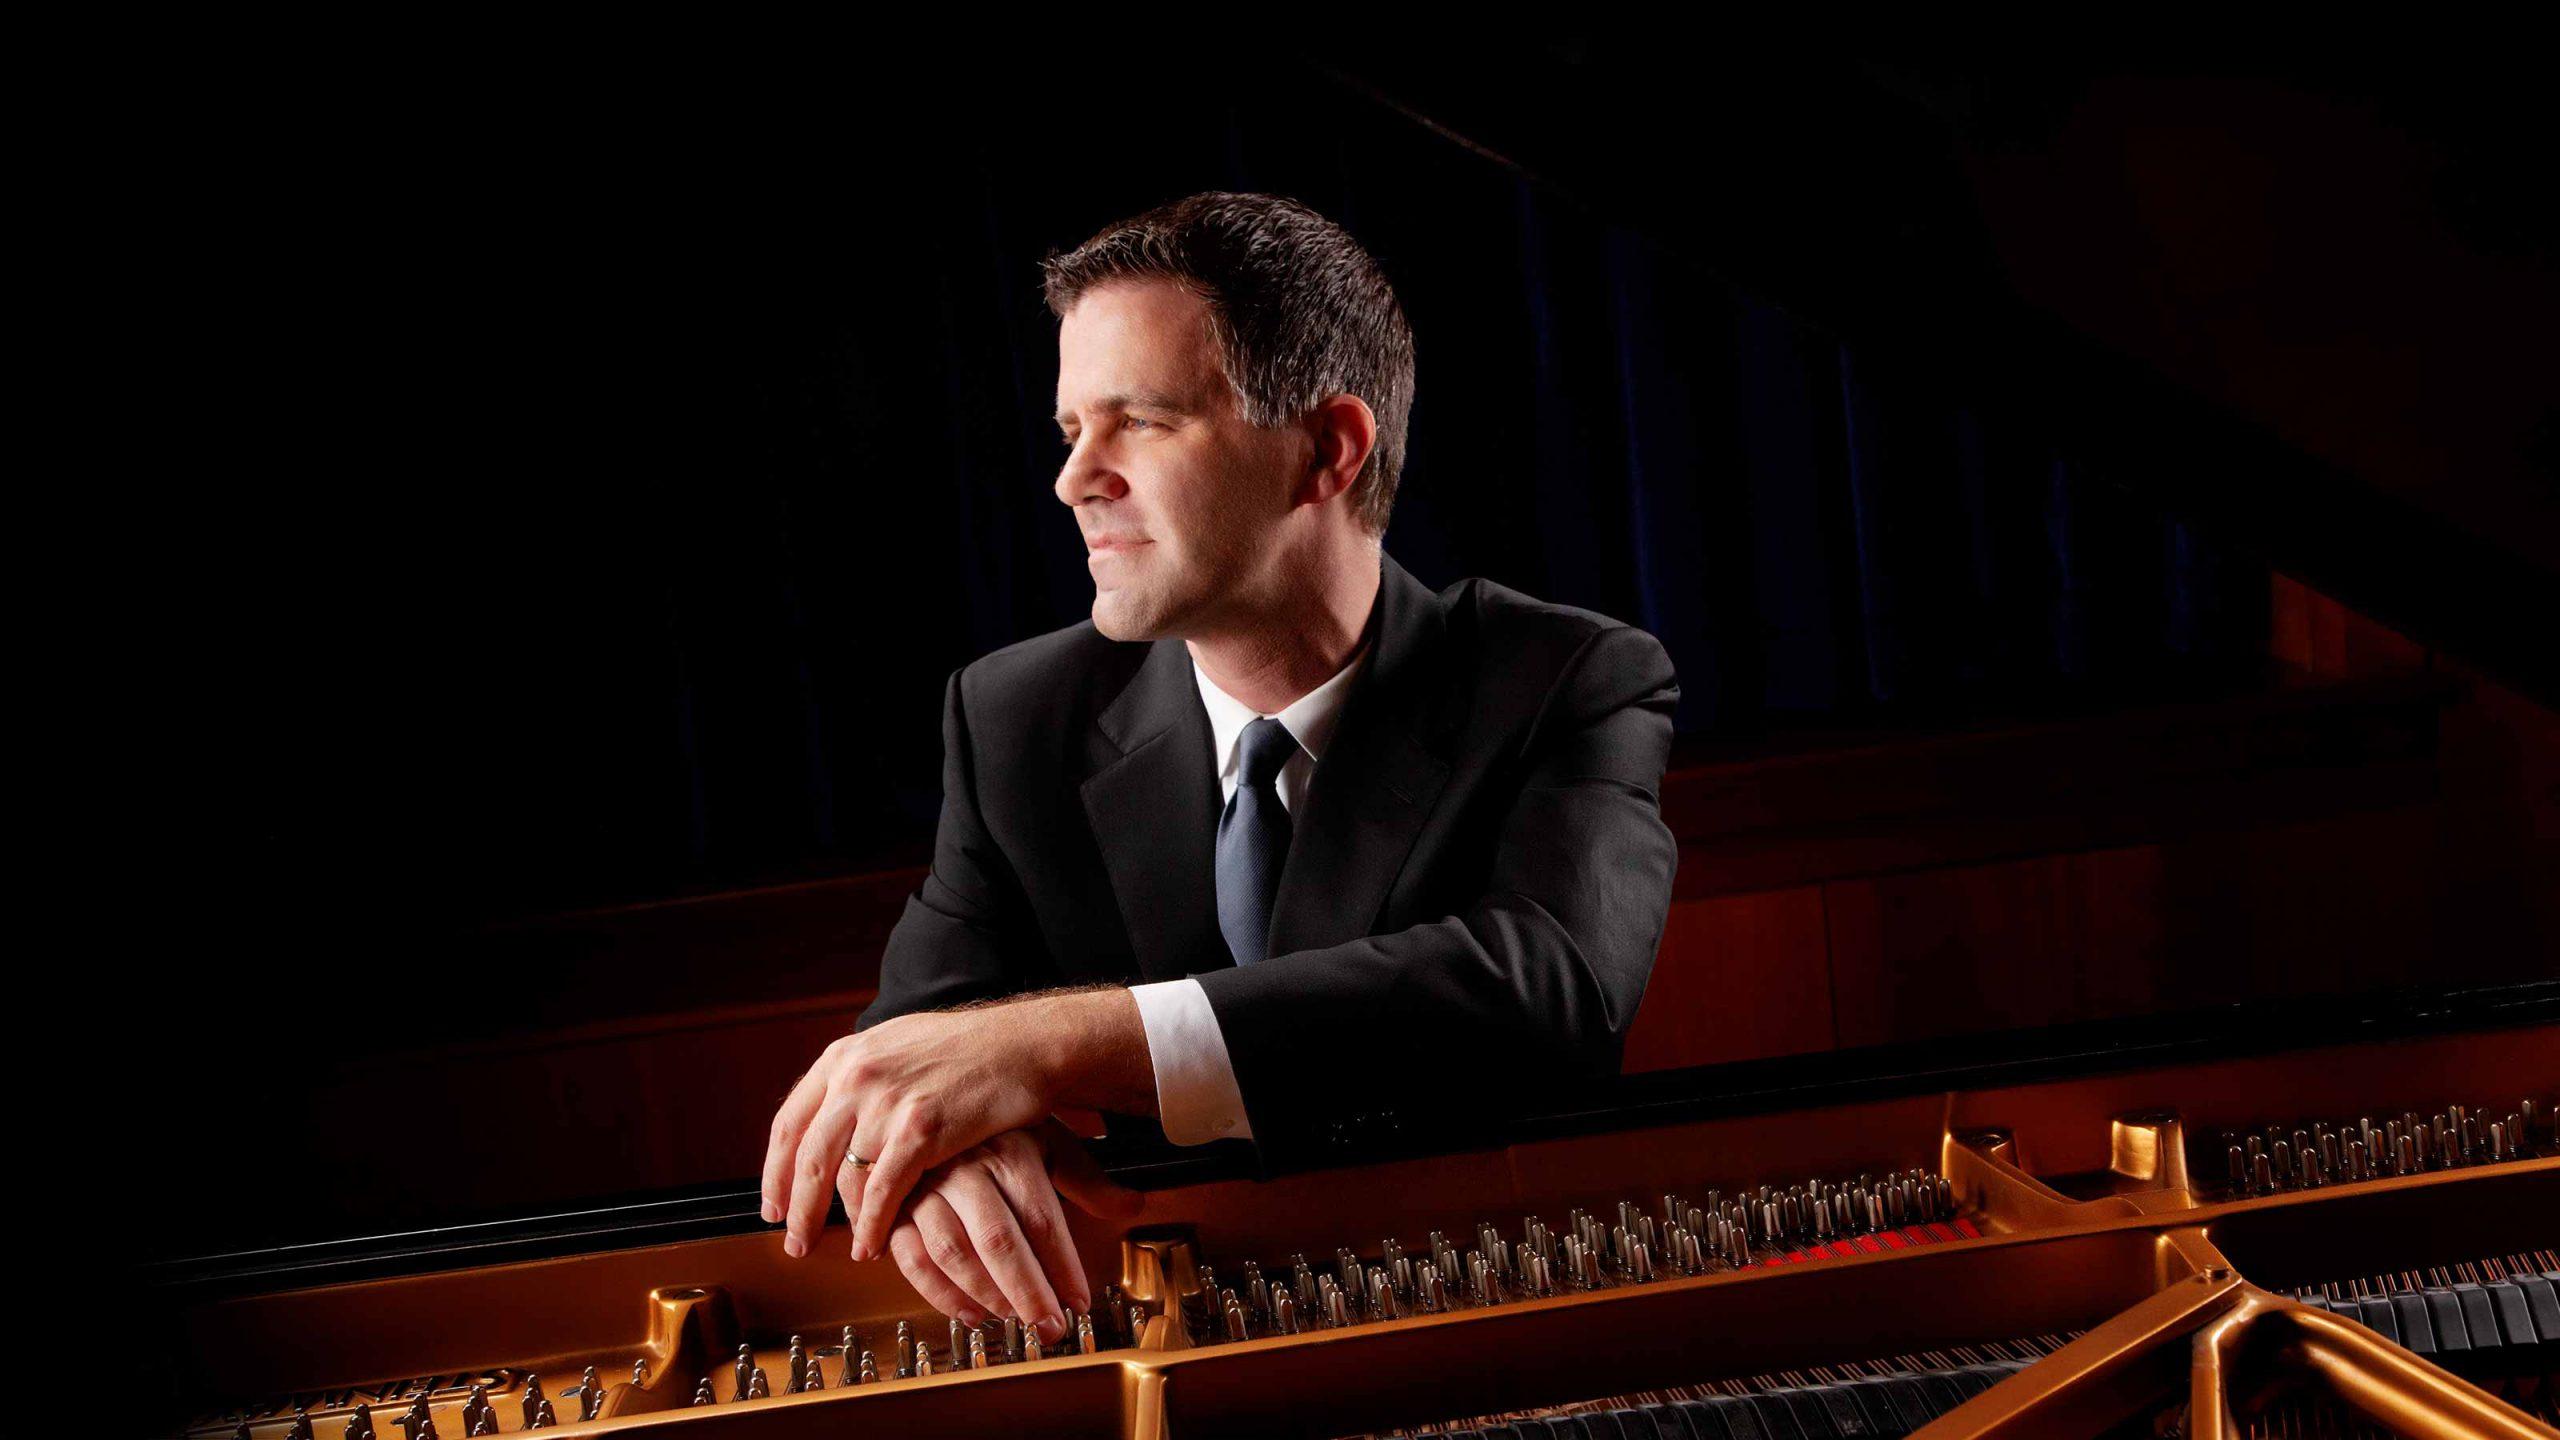 Joseph Rackers at an open piano